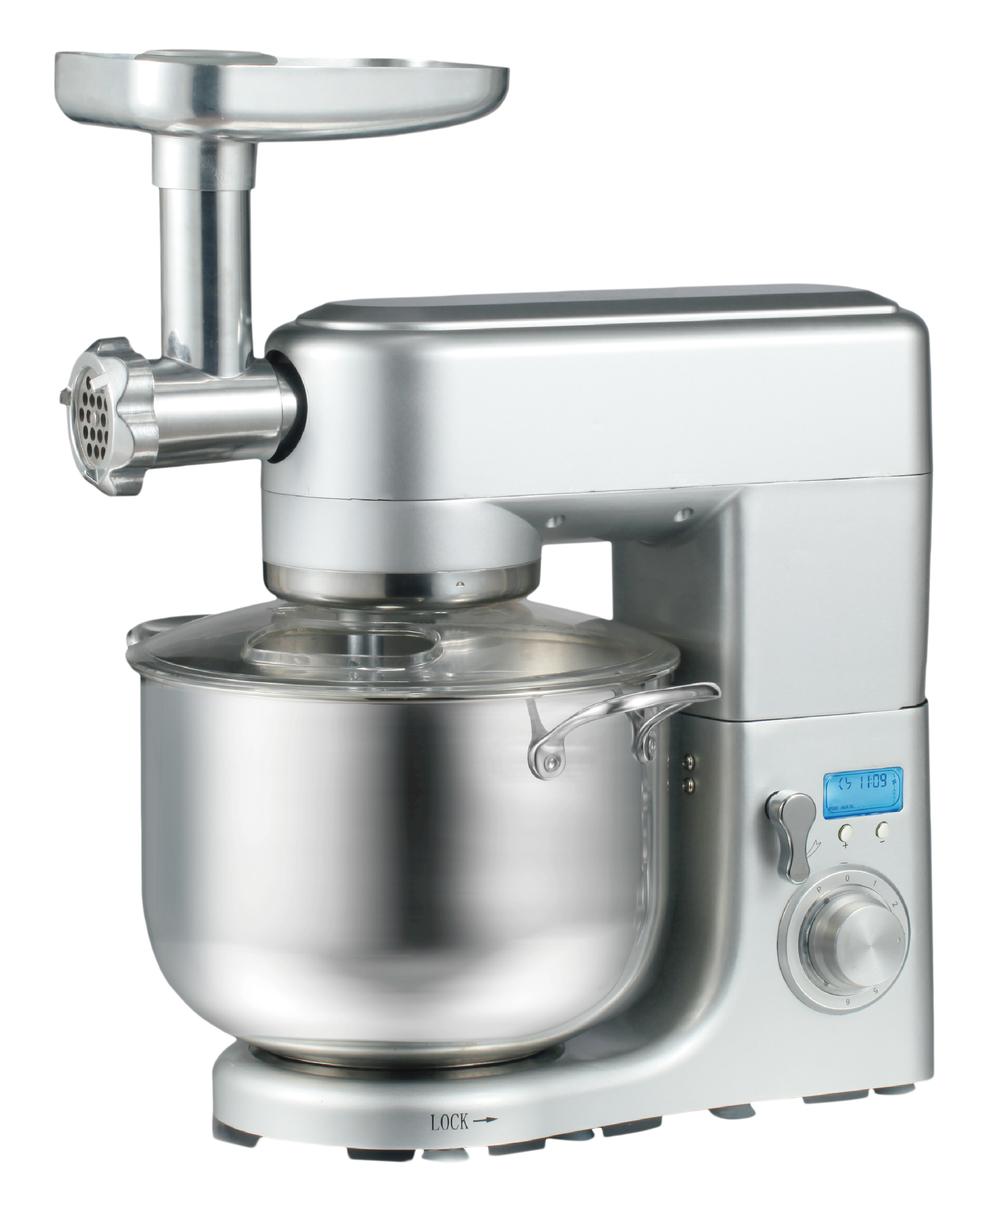 10L 1500W home kitchen appliancestand mixer with meat grinder